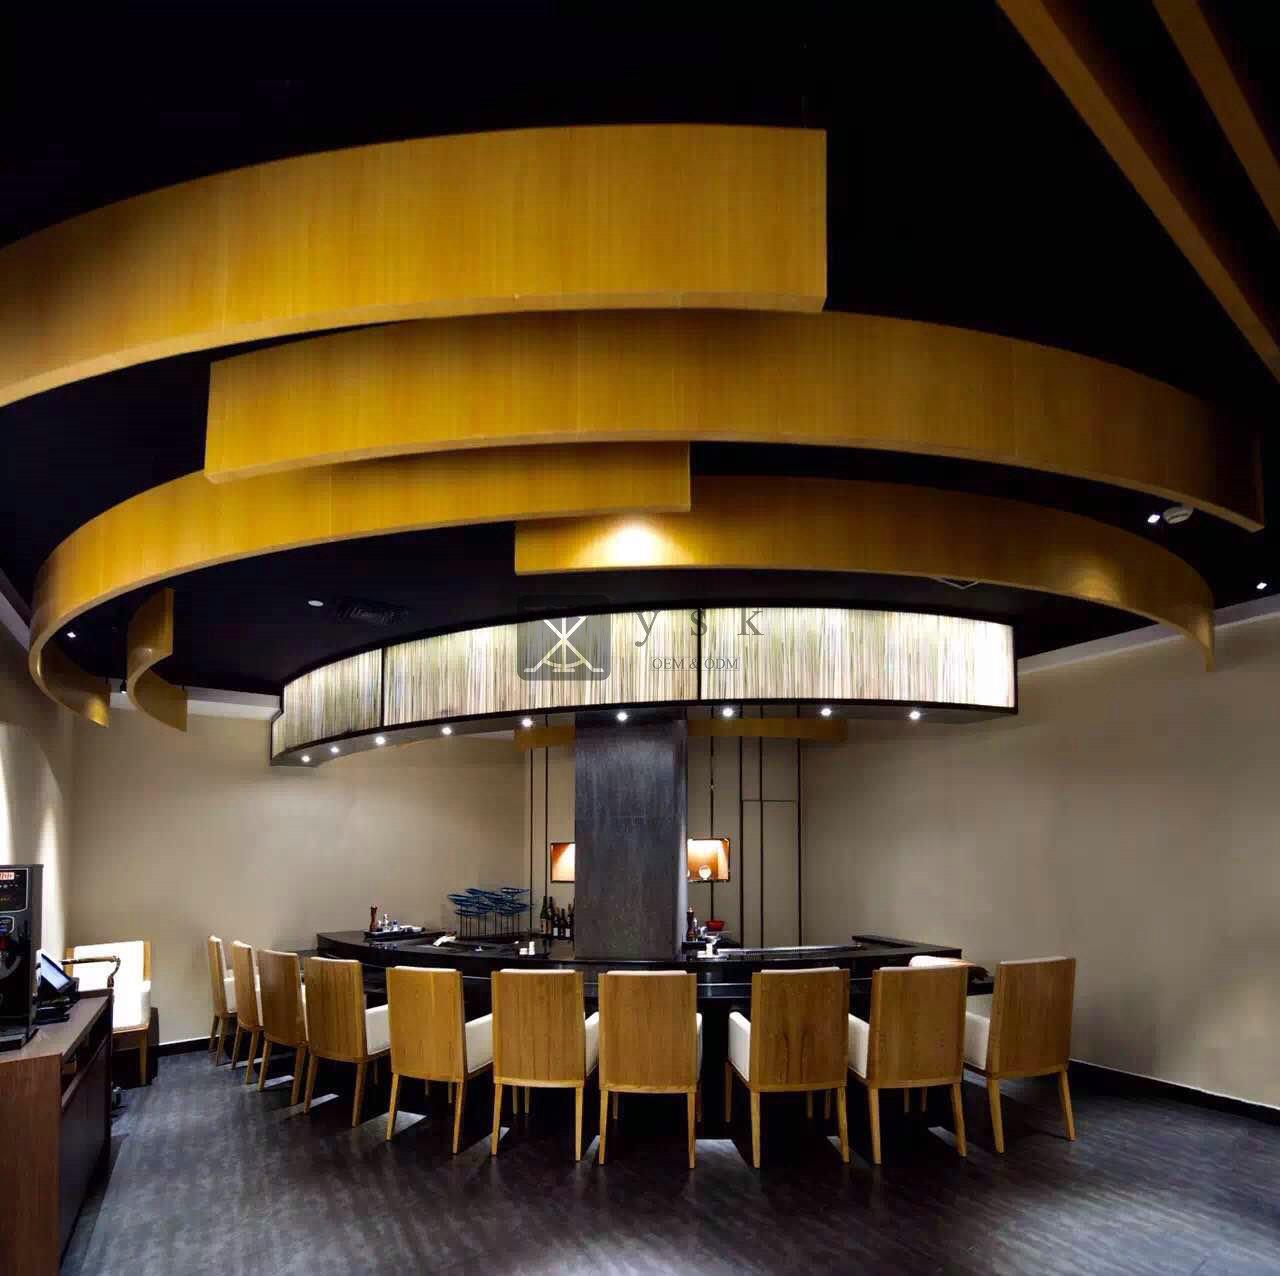 Japanese restaurant in guangzhou ysk hotel furniture